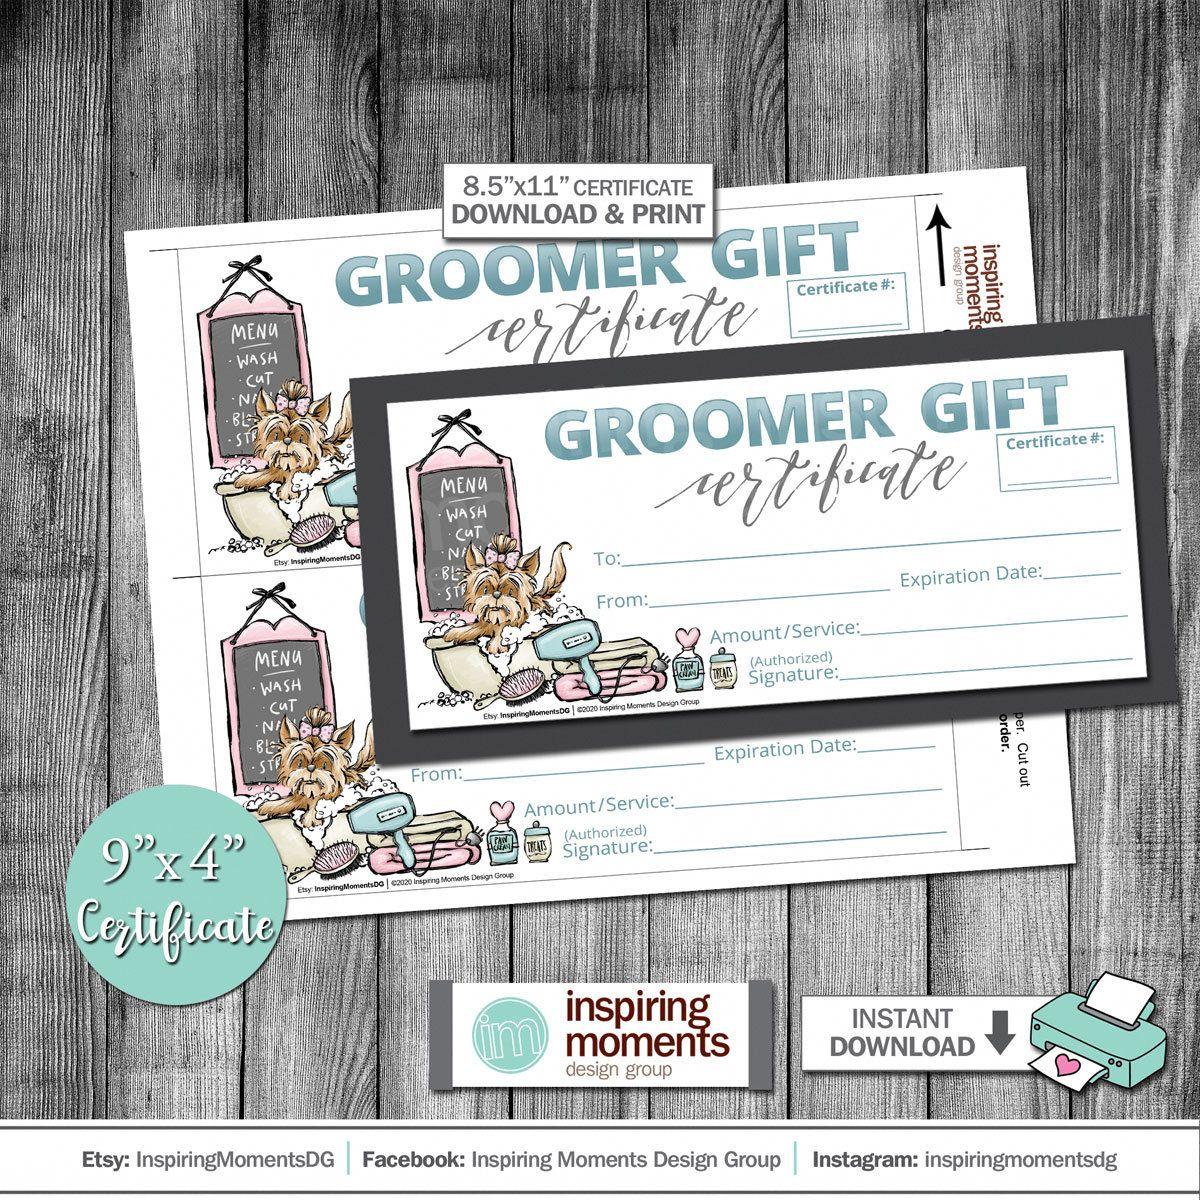 Dog grooming gift certificate groomer pet shop store